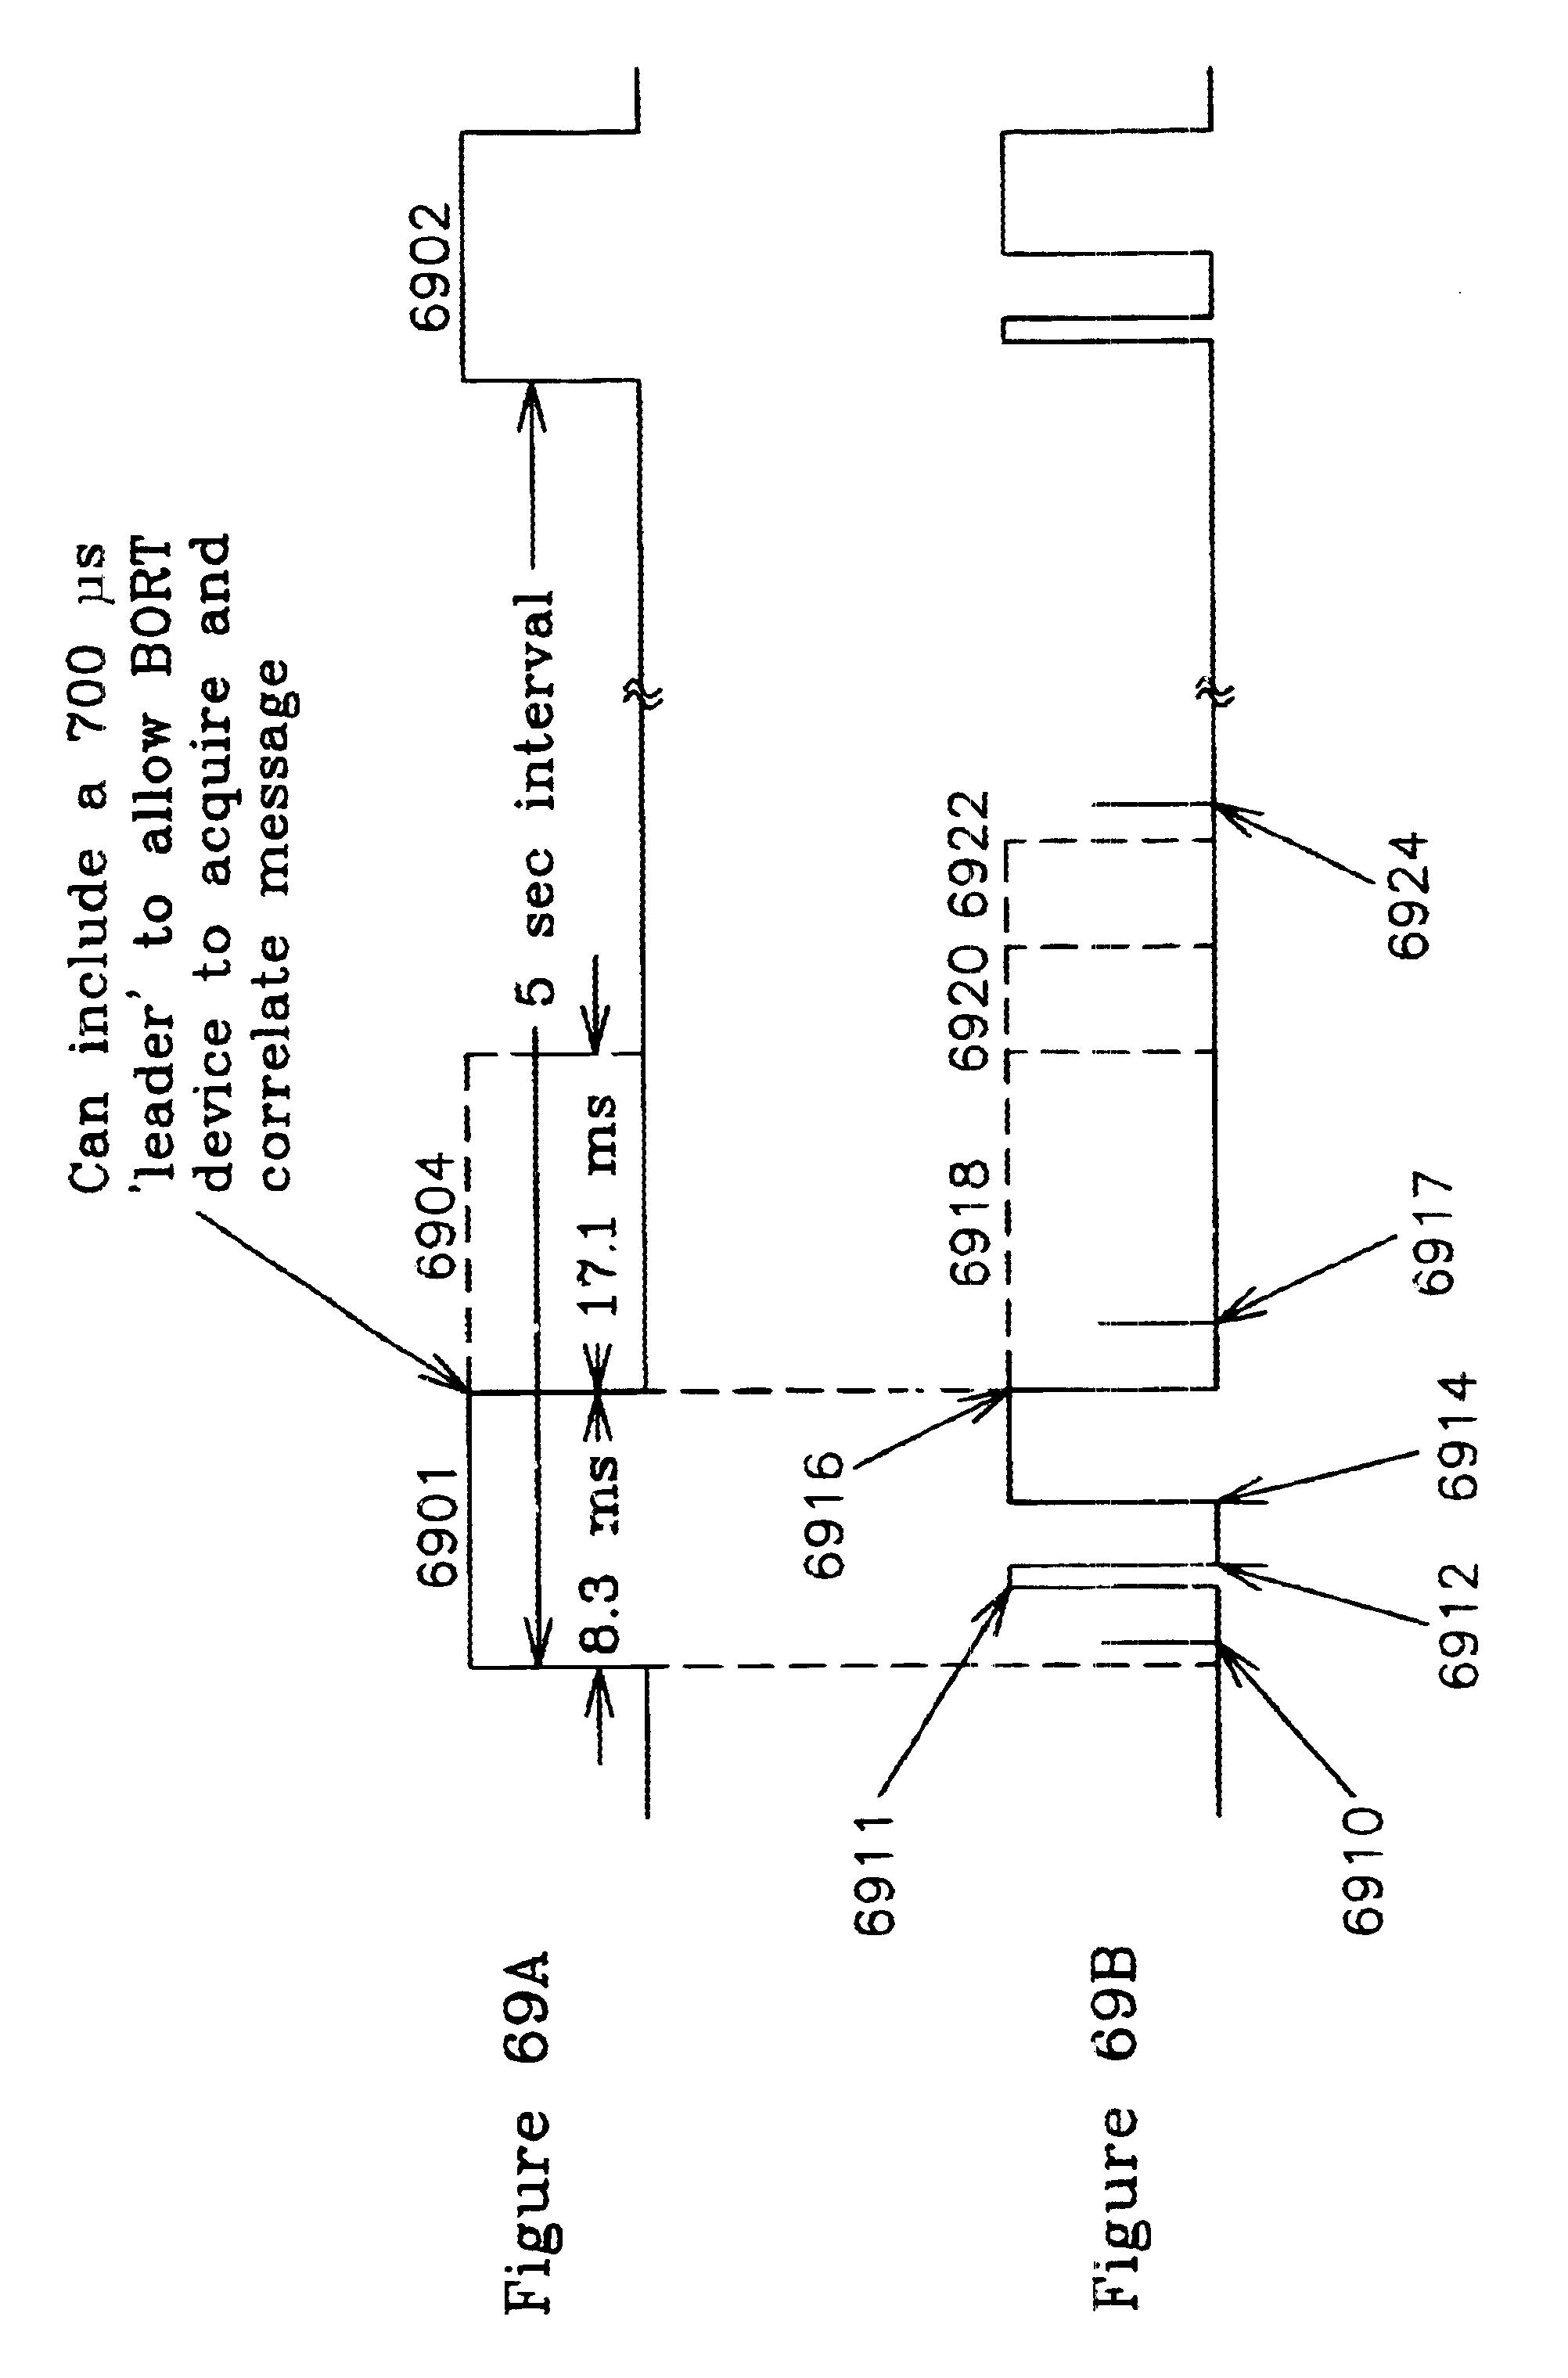 Patent US 6,639,939 B1